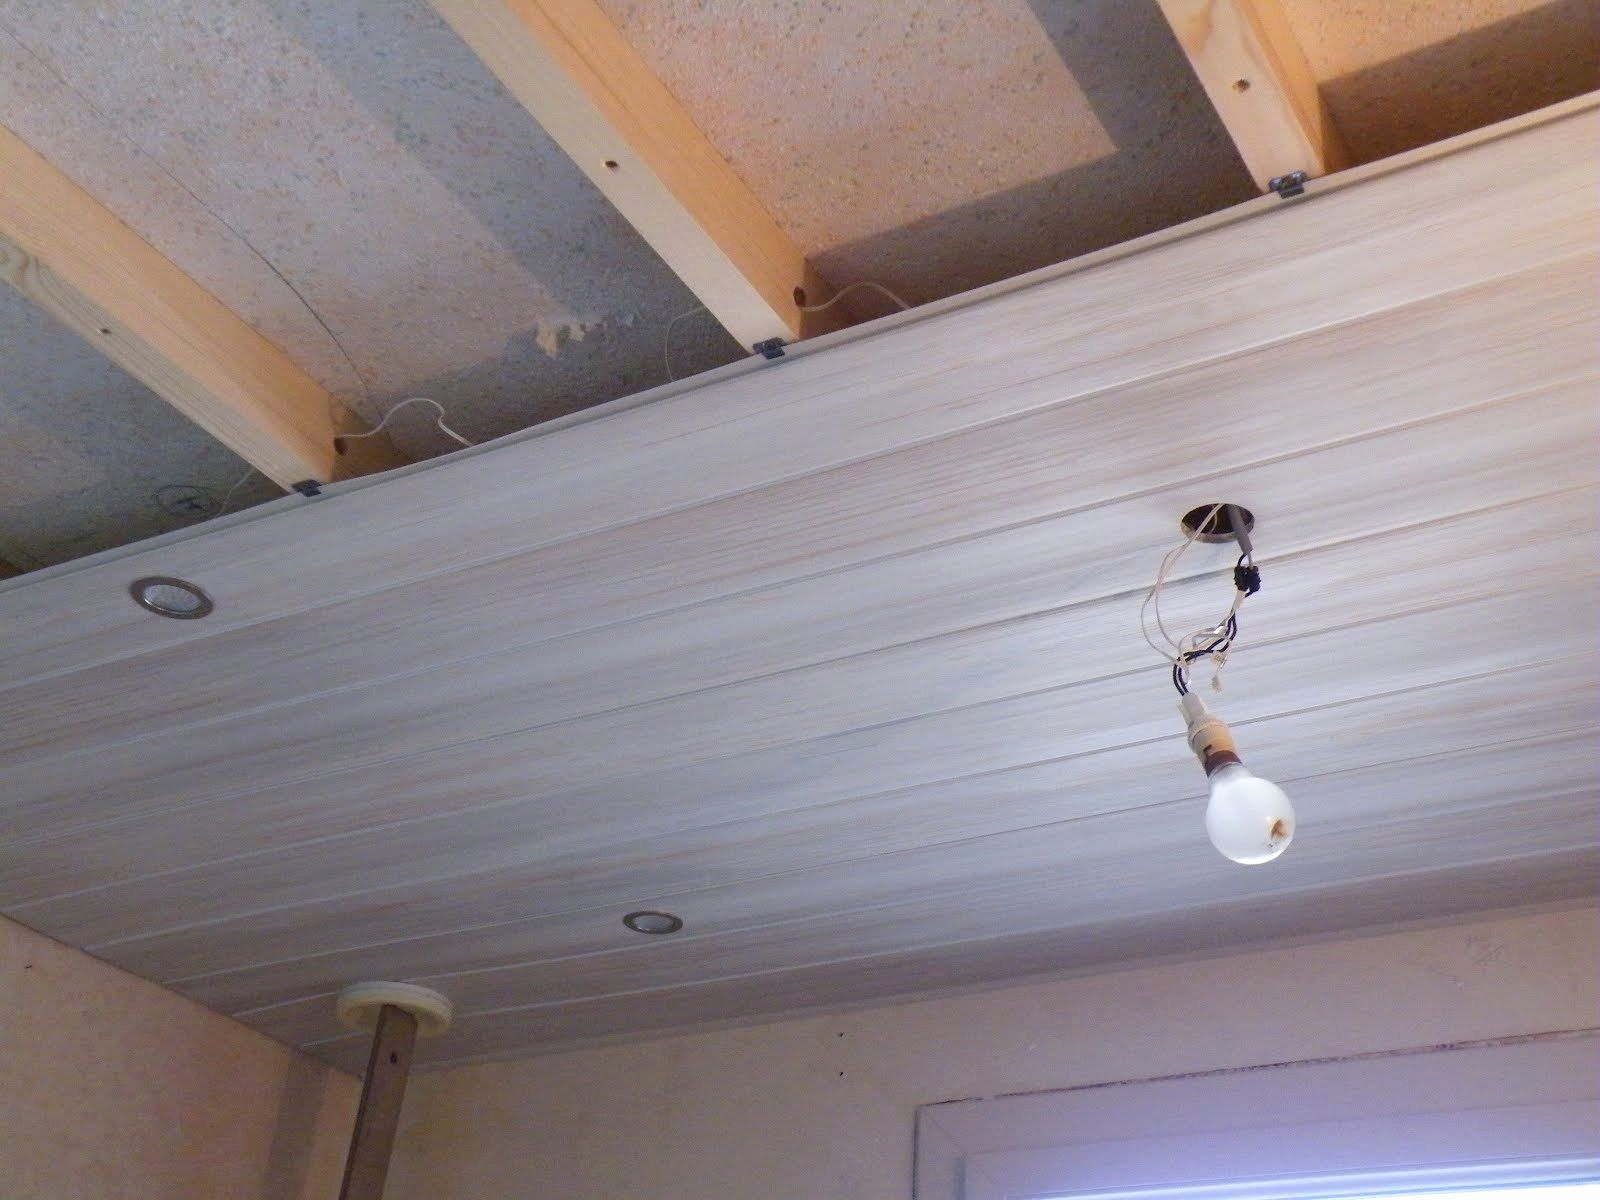 19 Faux Plafond Pour Salle De Bain Check more at https://iqkltx